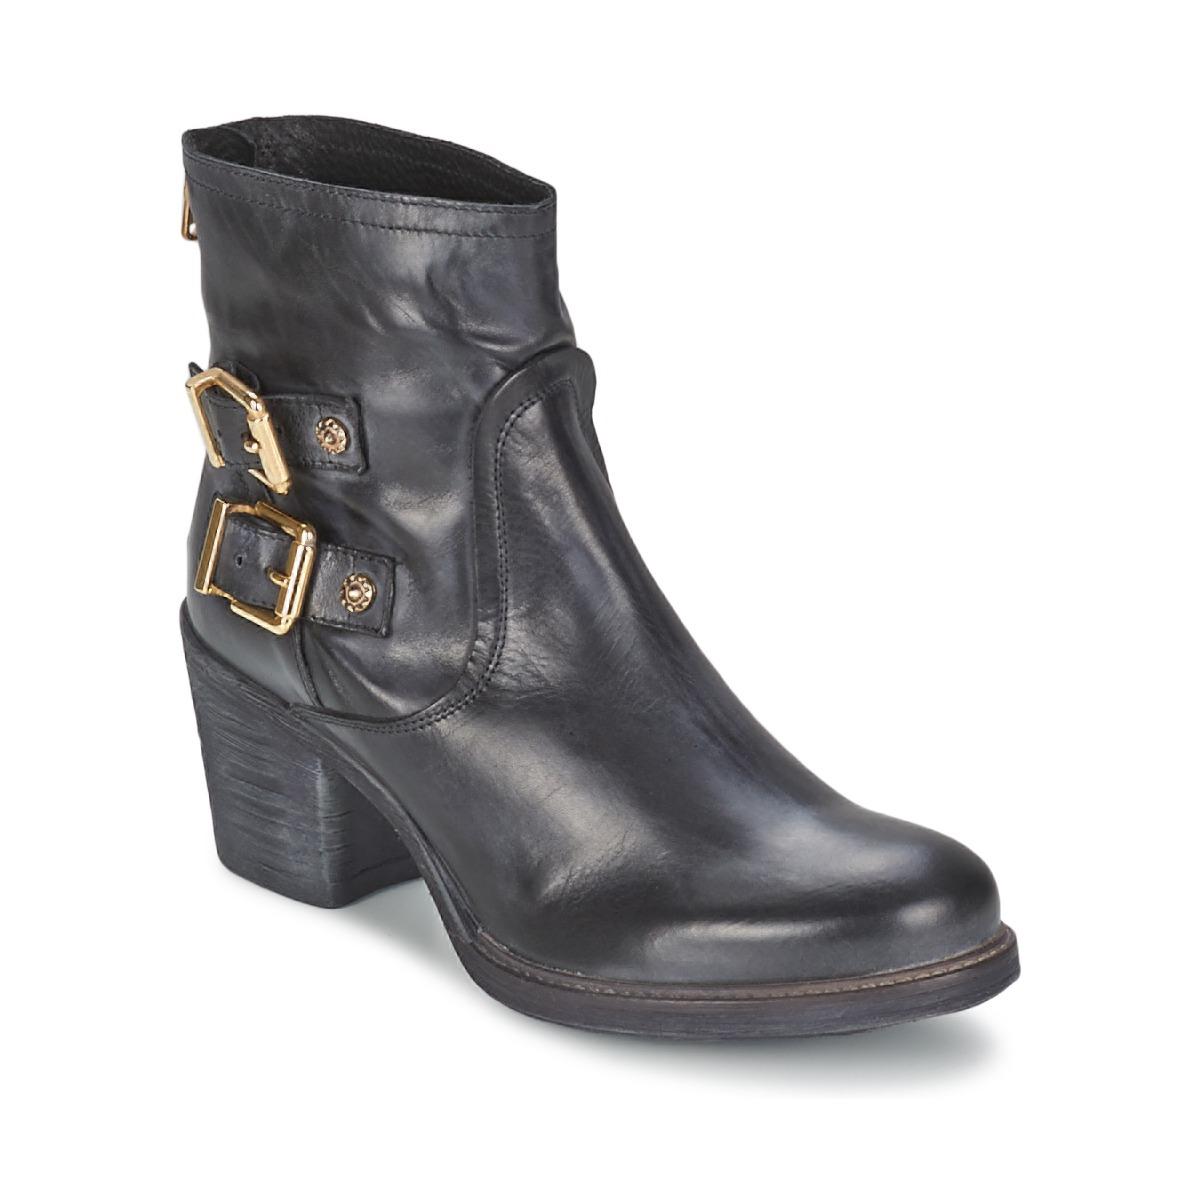 Kengät Meline LODU